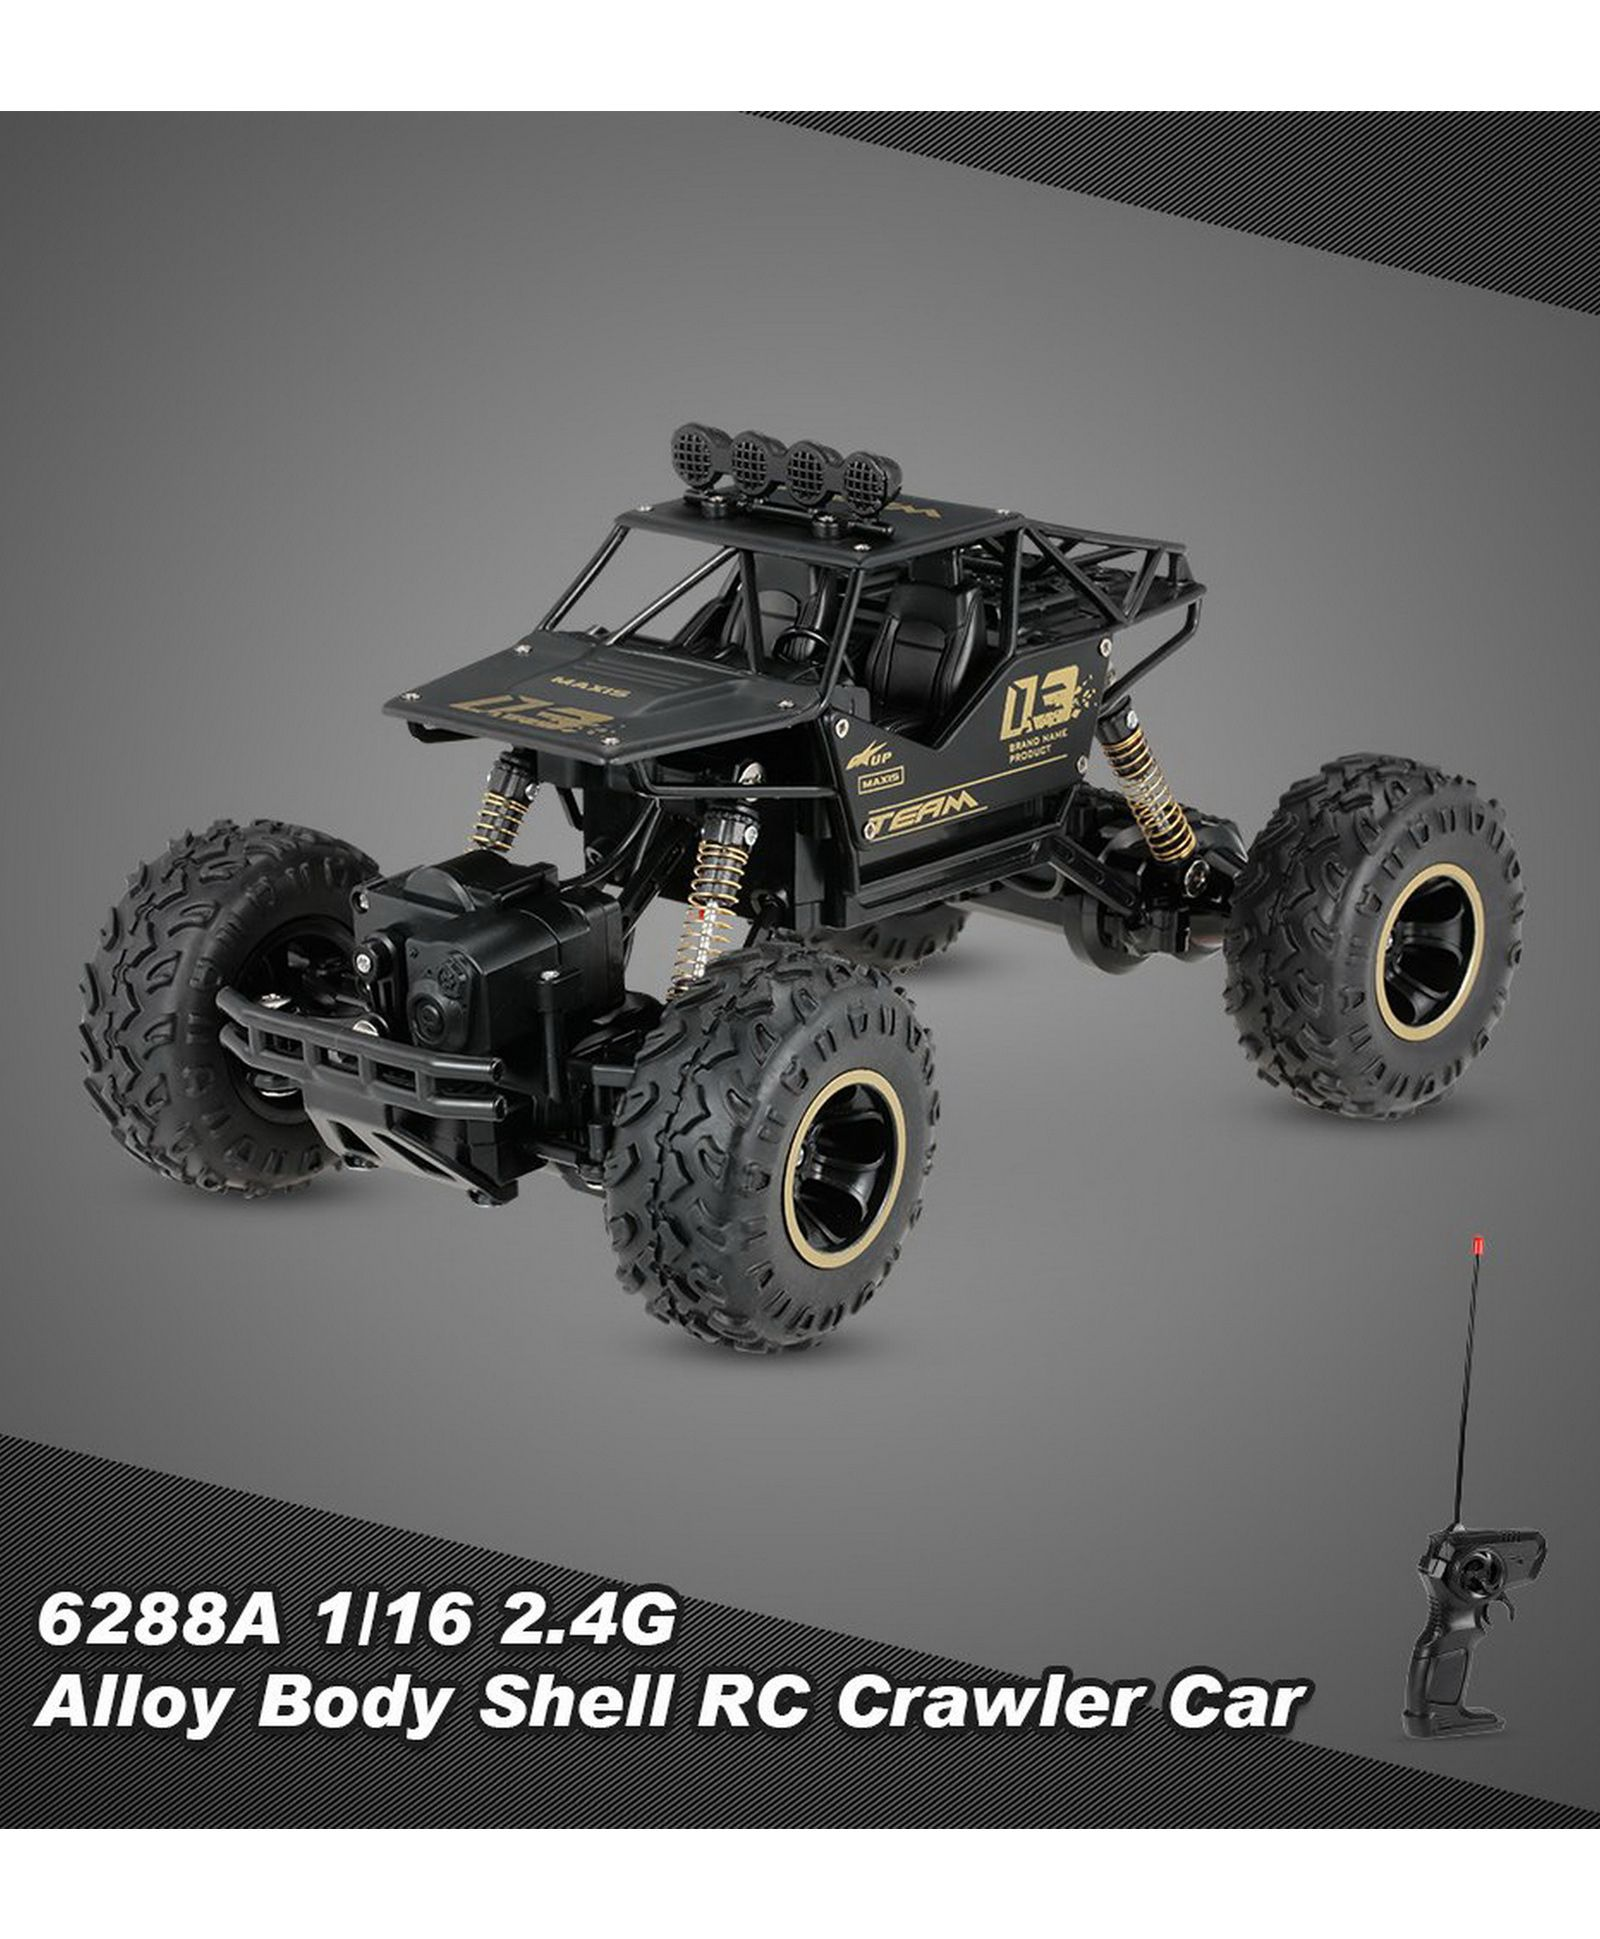 Yamaha Remote Control Rock Crawler Toy Black Online India